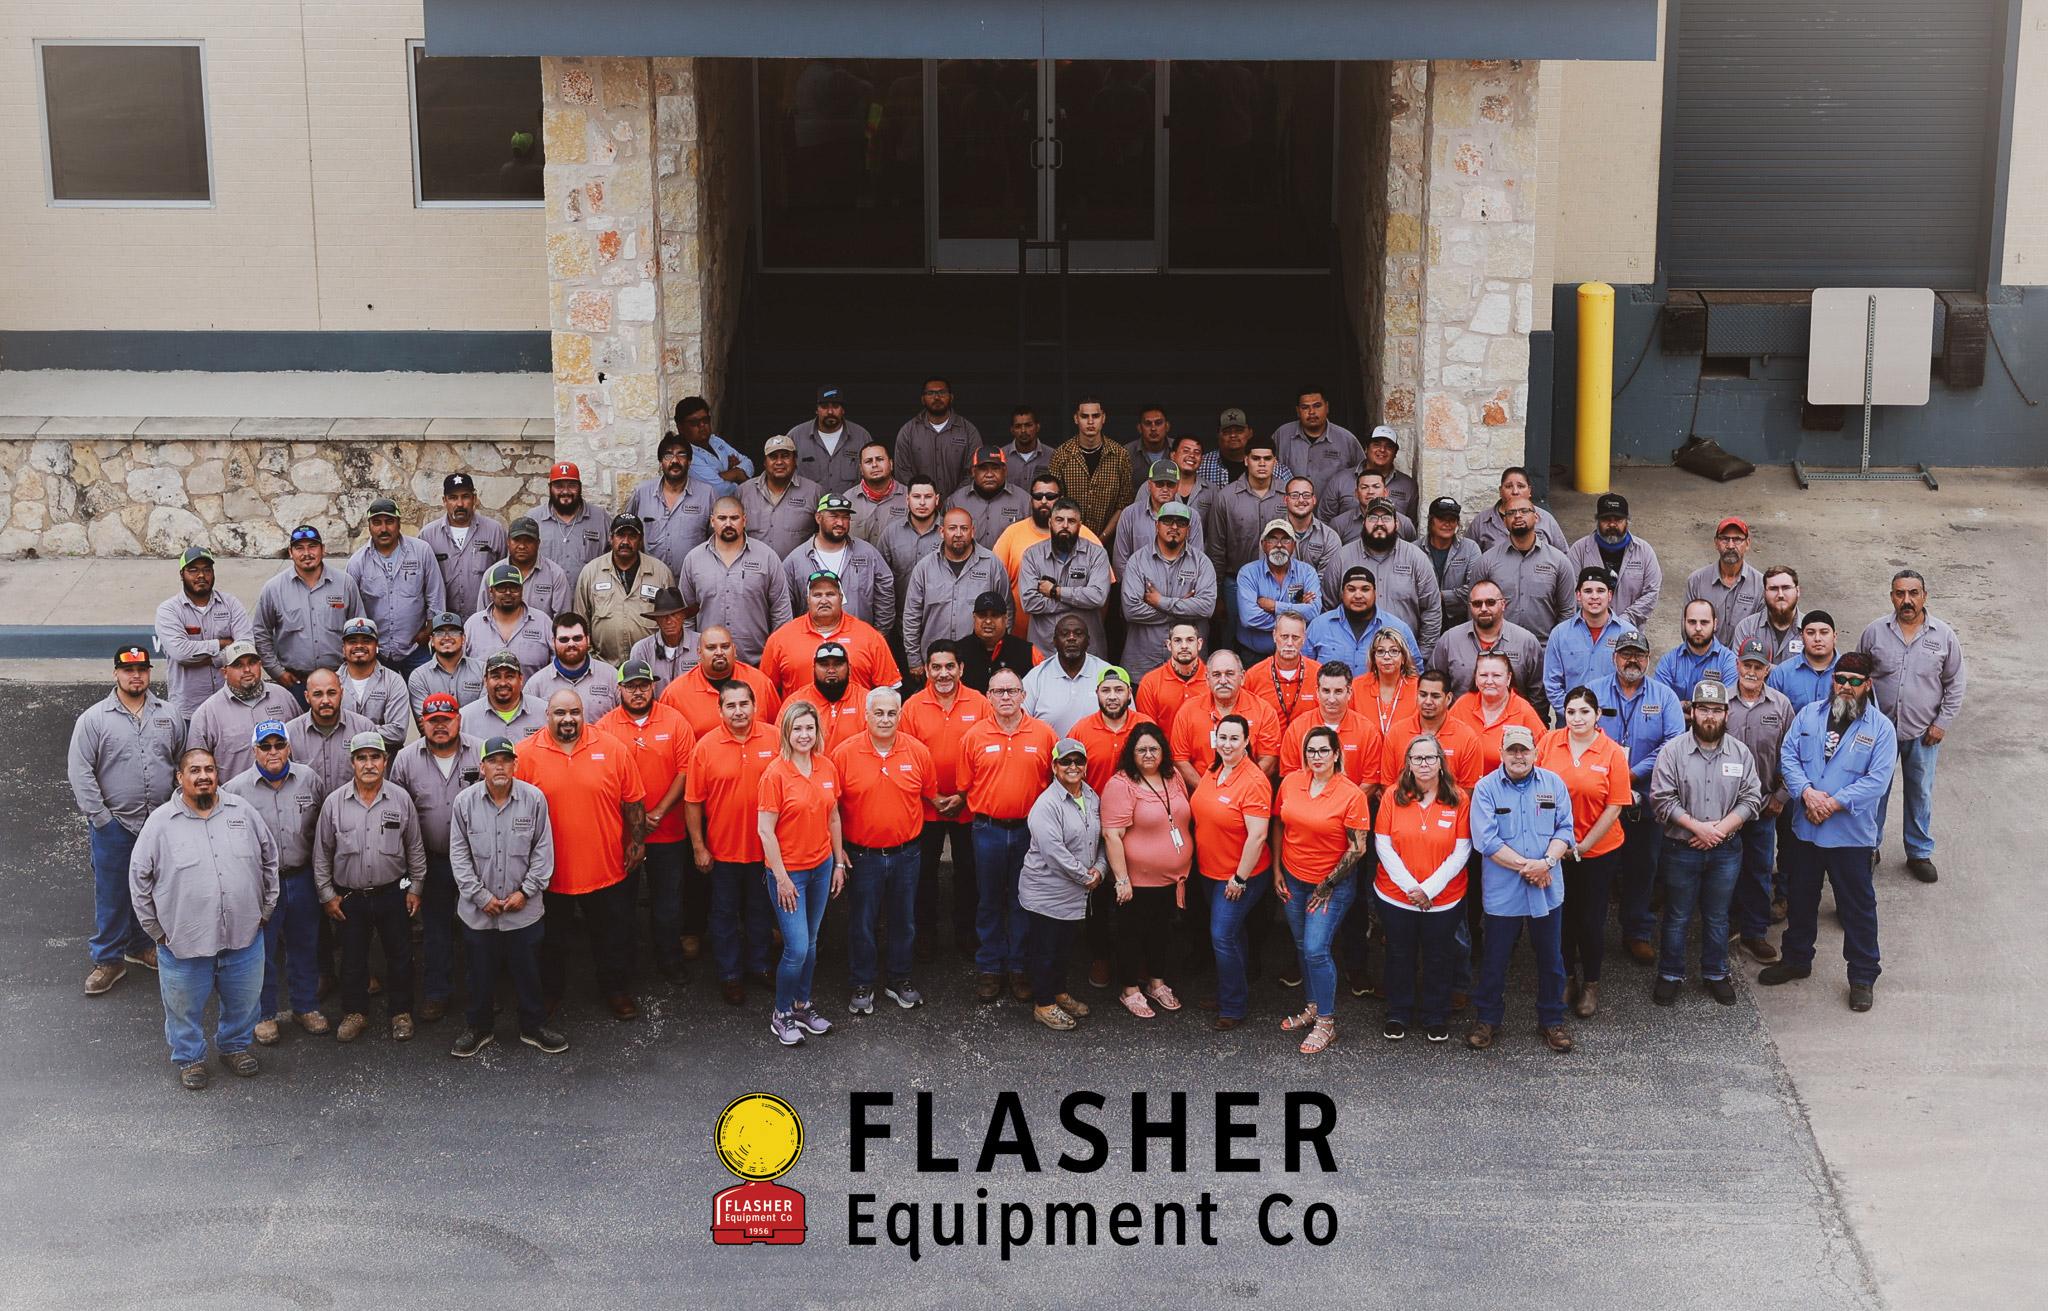 Flasher Equipment Company Employees